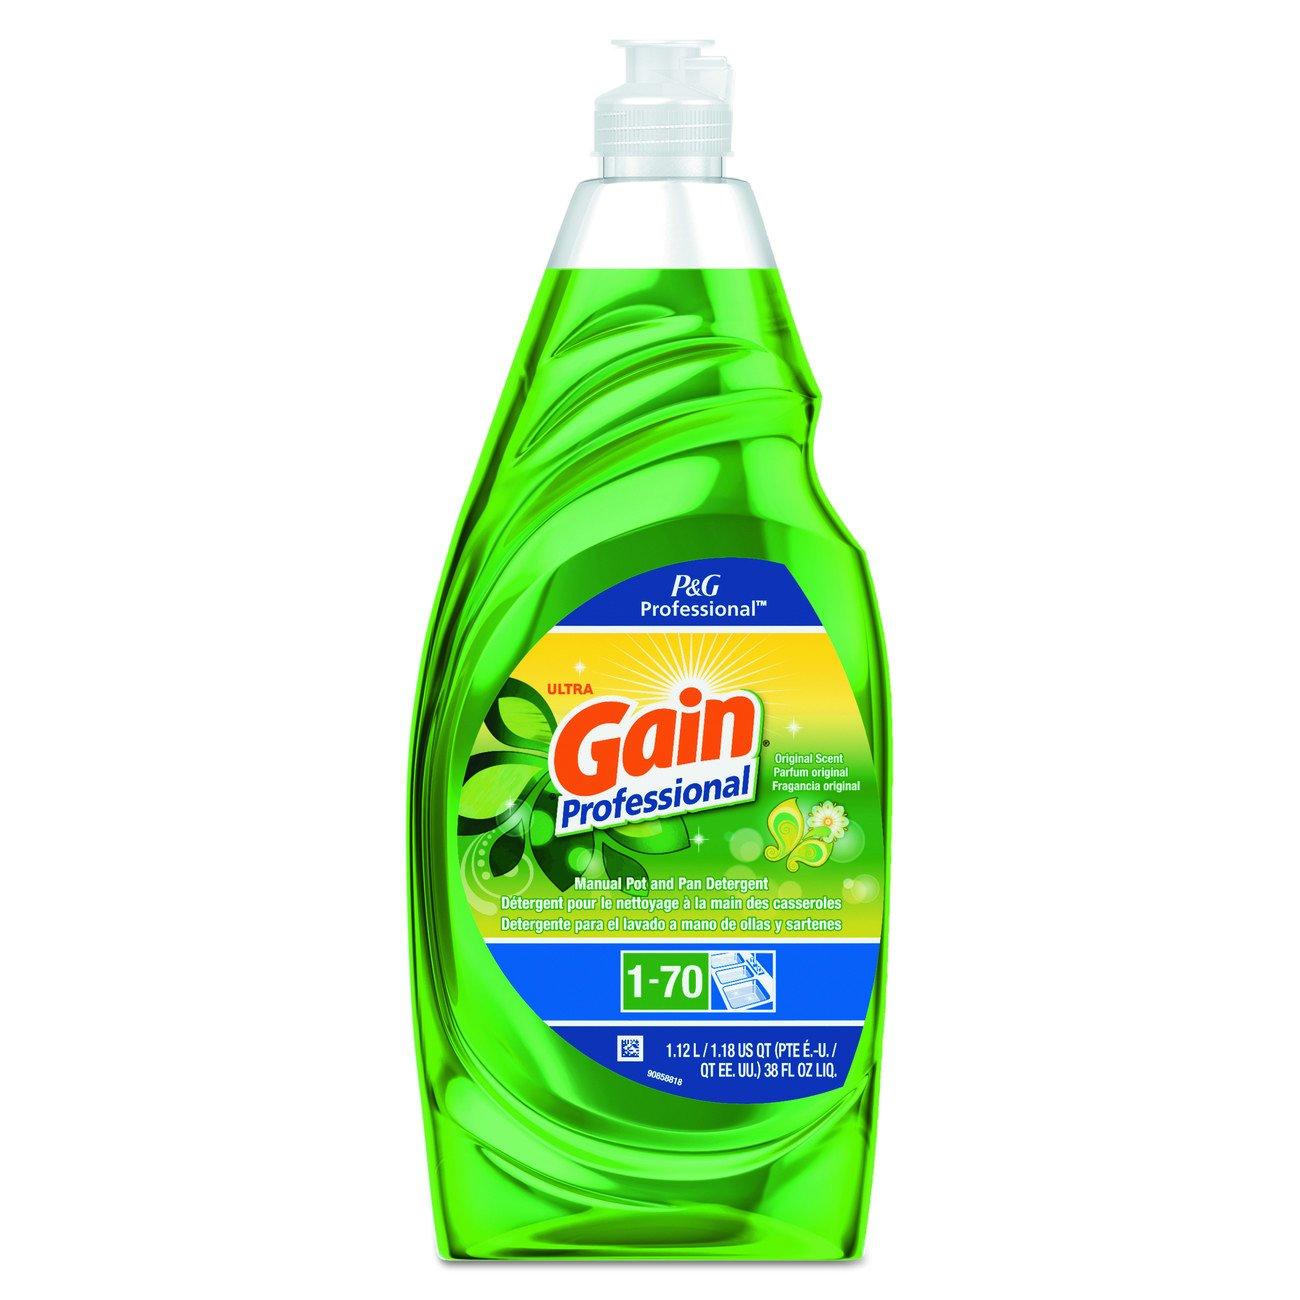 Gain 70740 Professional Manual Pot and Pan Dish Detergent, Original, 38 oz. Bottle Capacity